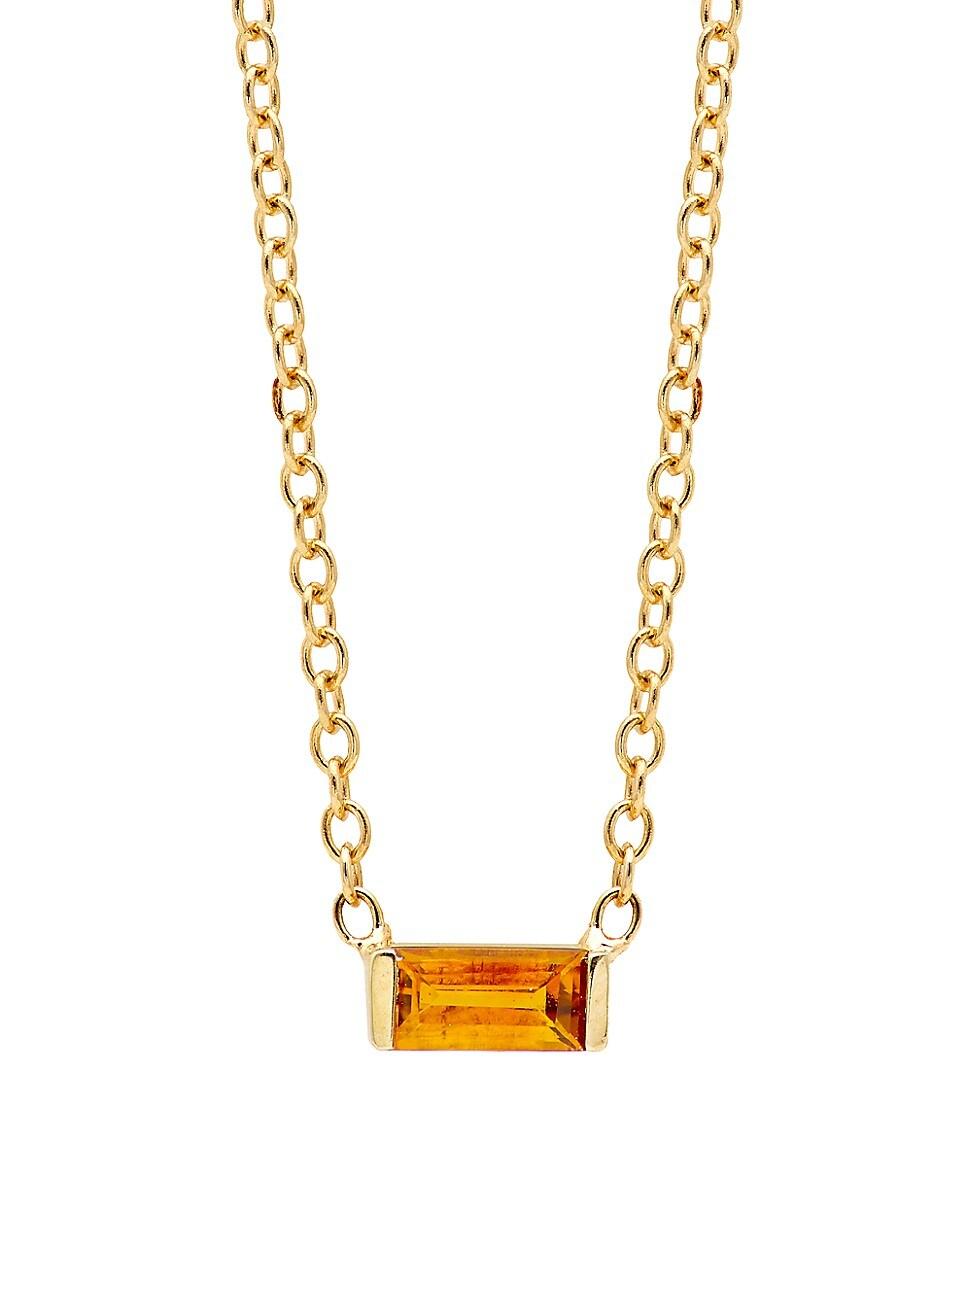 Zoë Chicco Women's Birthstones 14k Yellow Gold & Citrine Horizontal Baguette Necklace